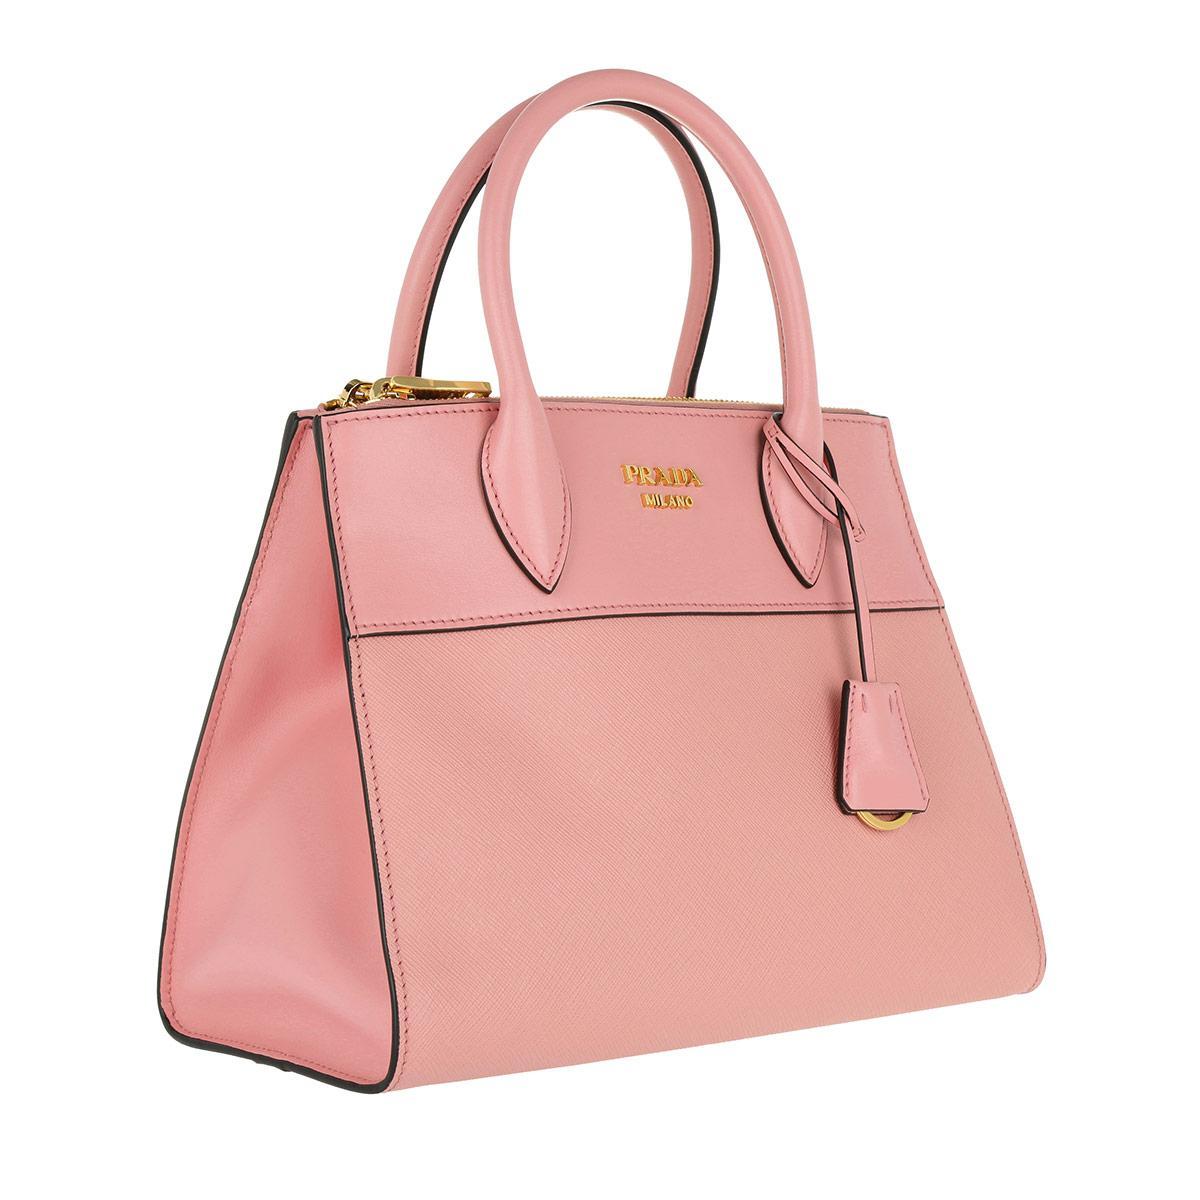 bd078ca41e27 ... bags handbags e7d98 be985 promo code for lyst prada saffiano city tote  petalo in pink d0cae dcbd6 ...